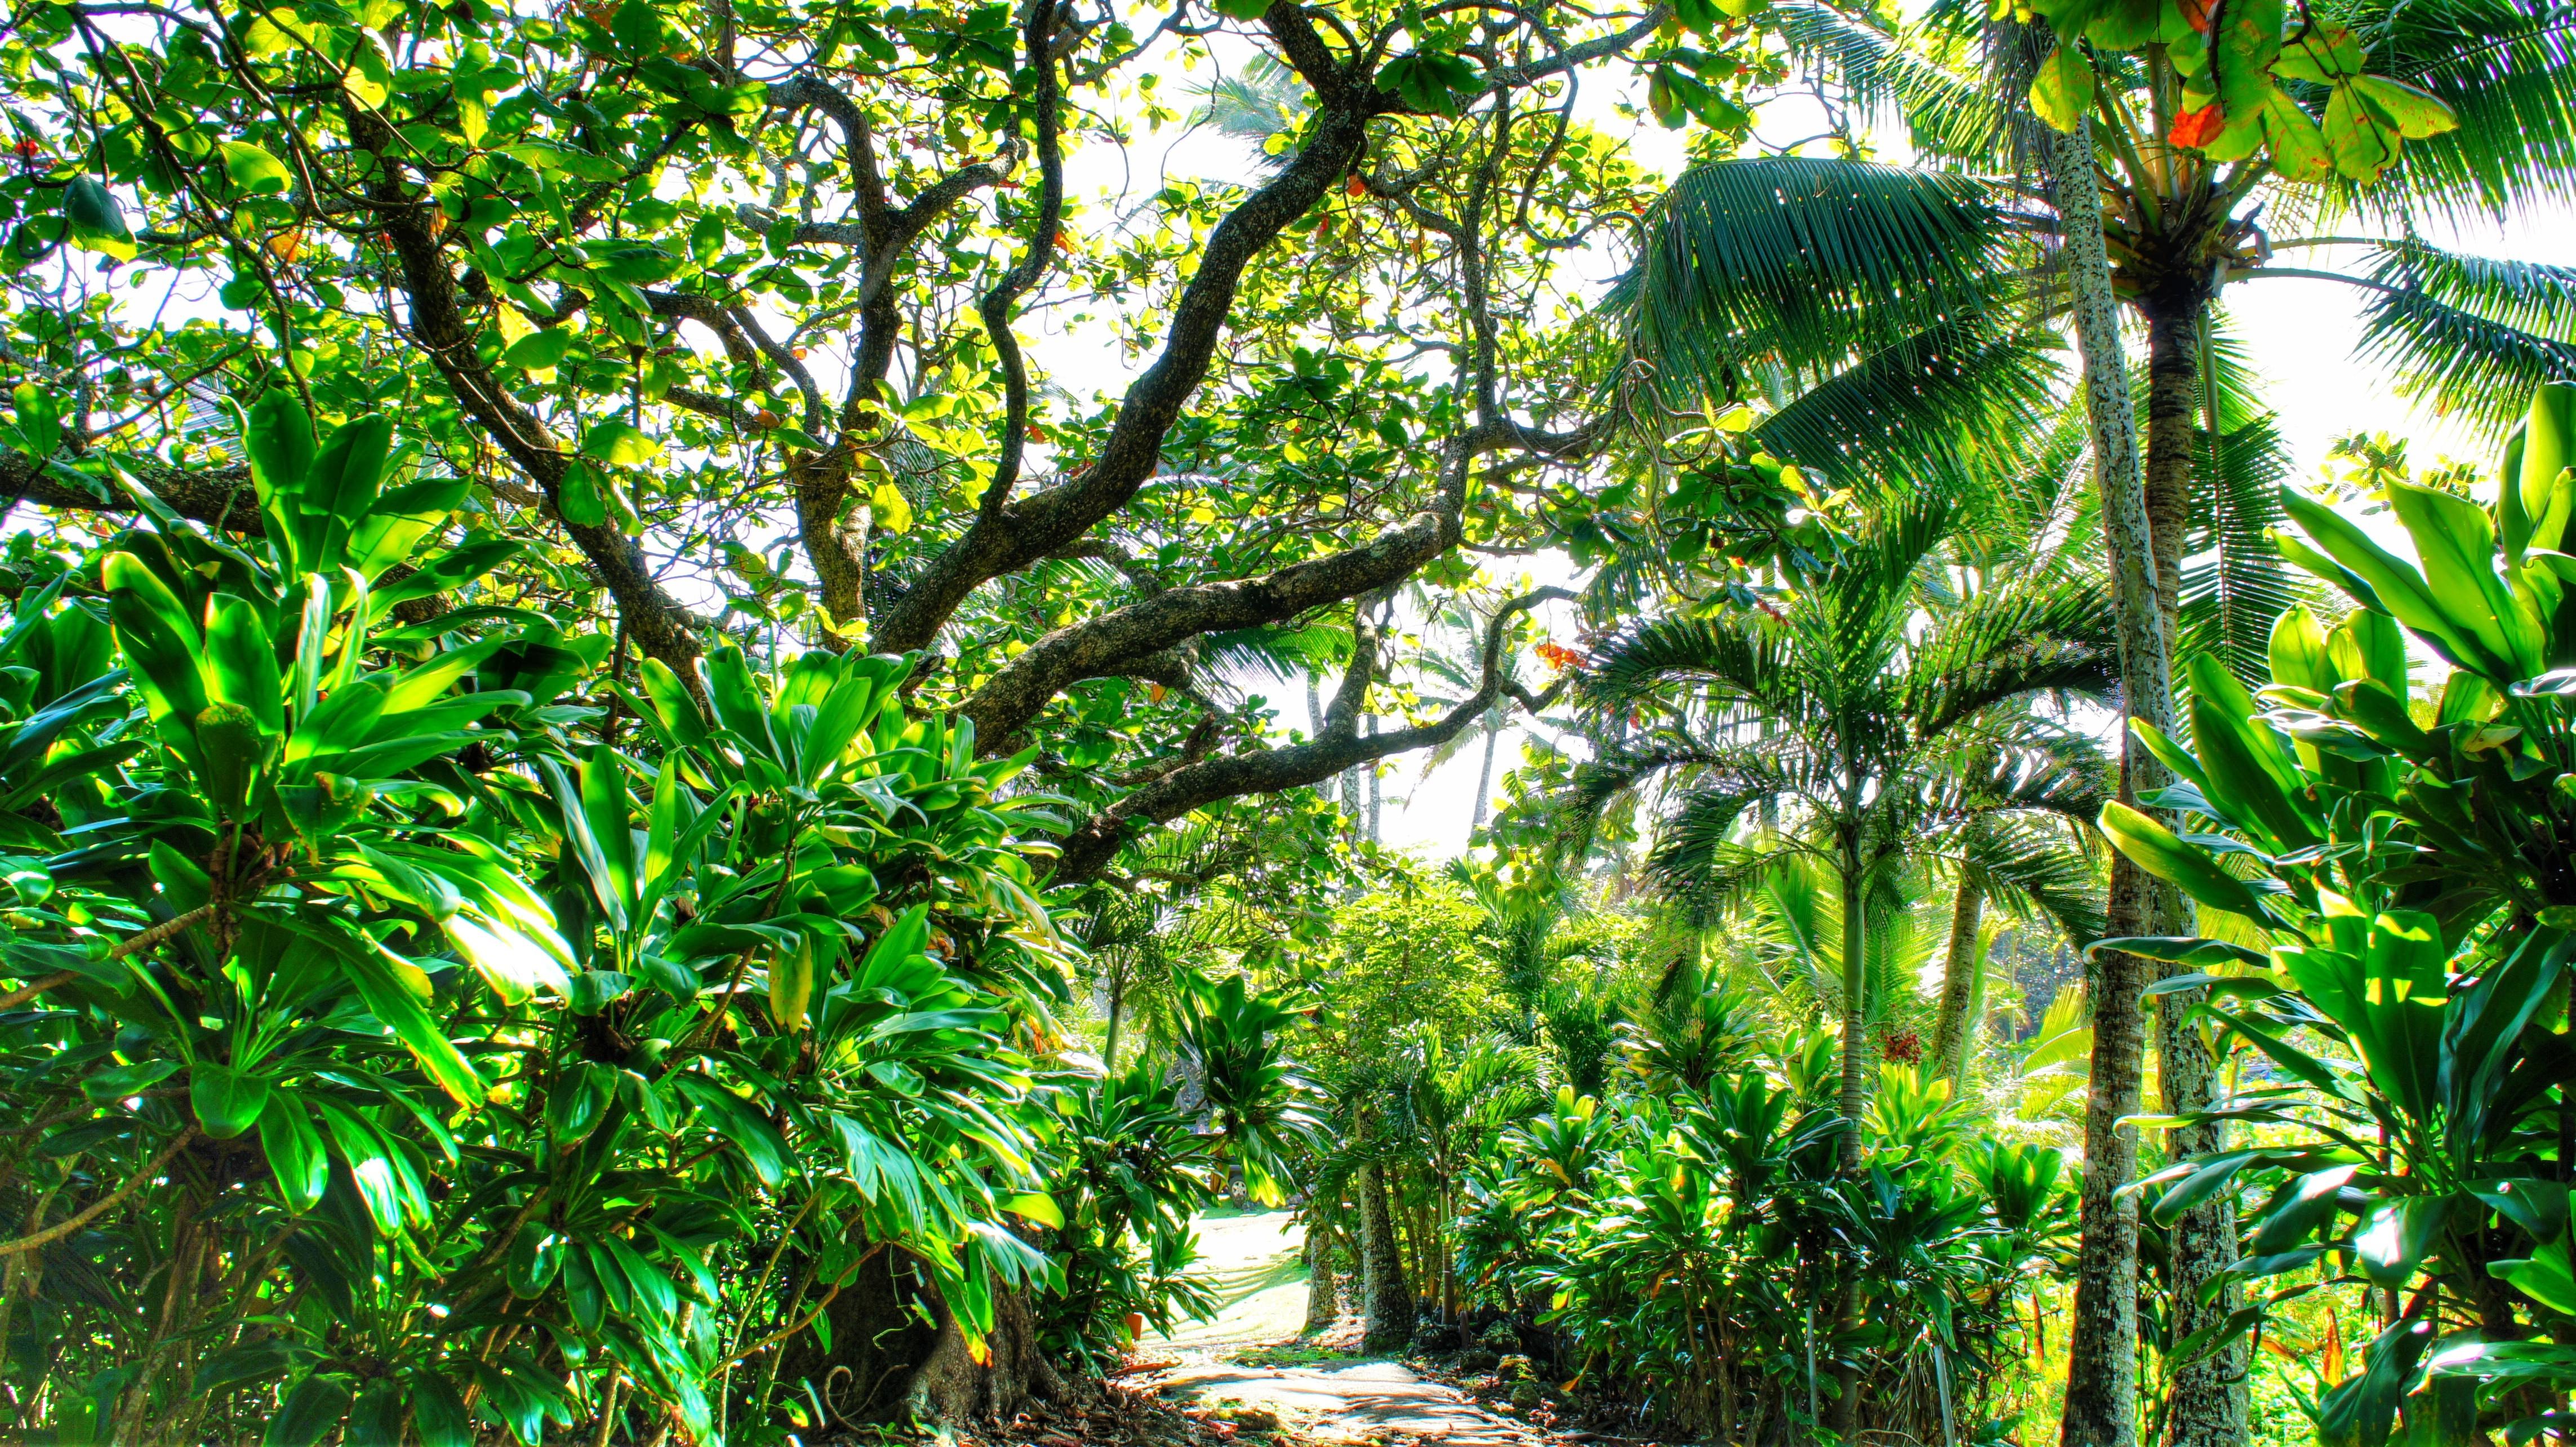 Wallpaper : waterfall, beach, branch, green, palm trees, jungle ...